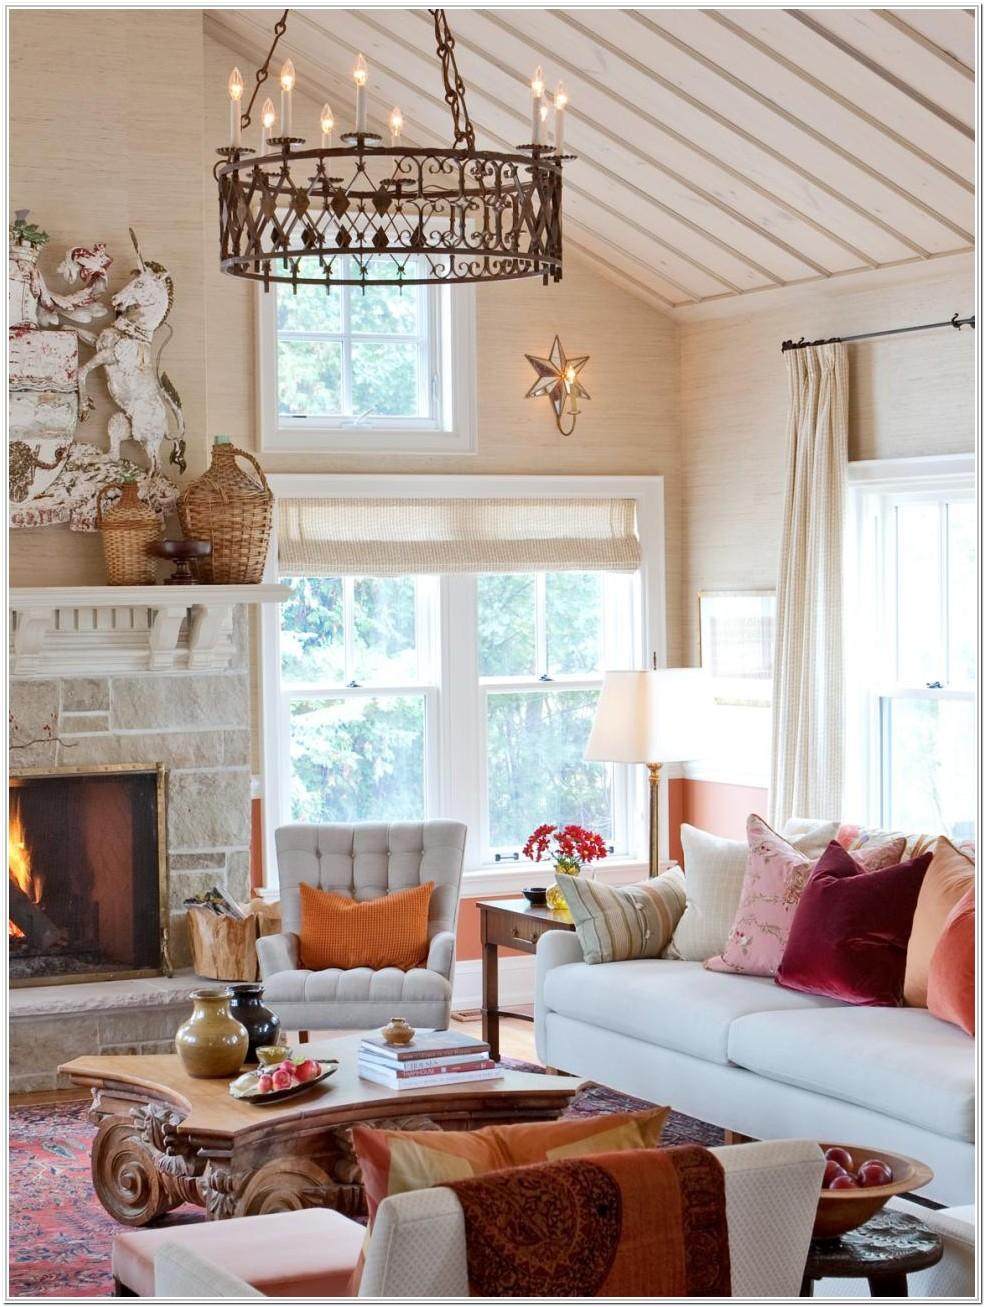 20 X 20 Living Room Ideas